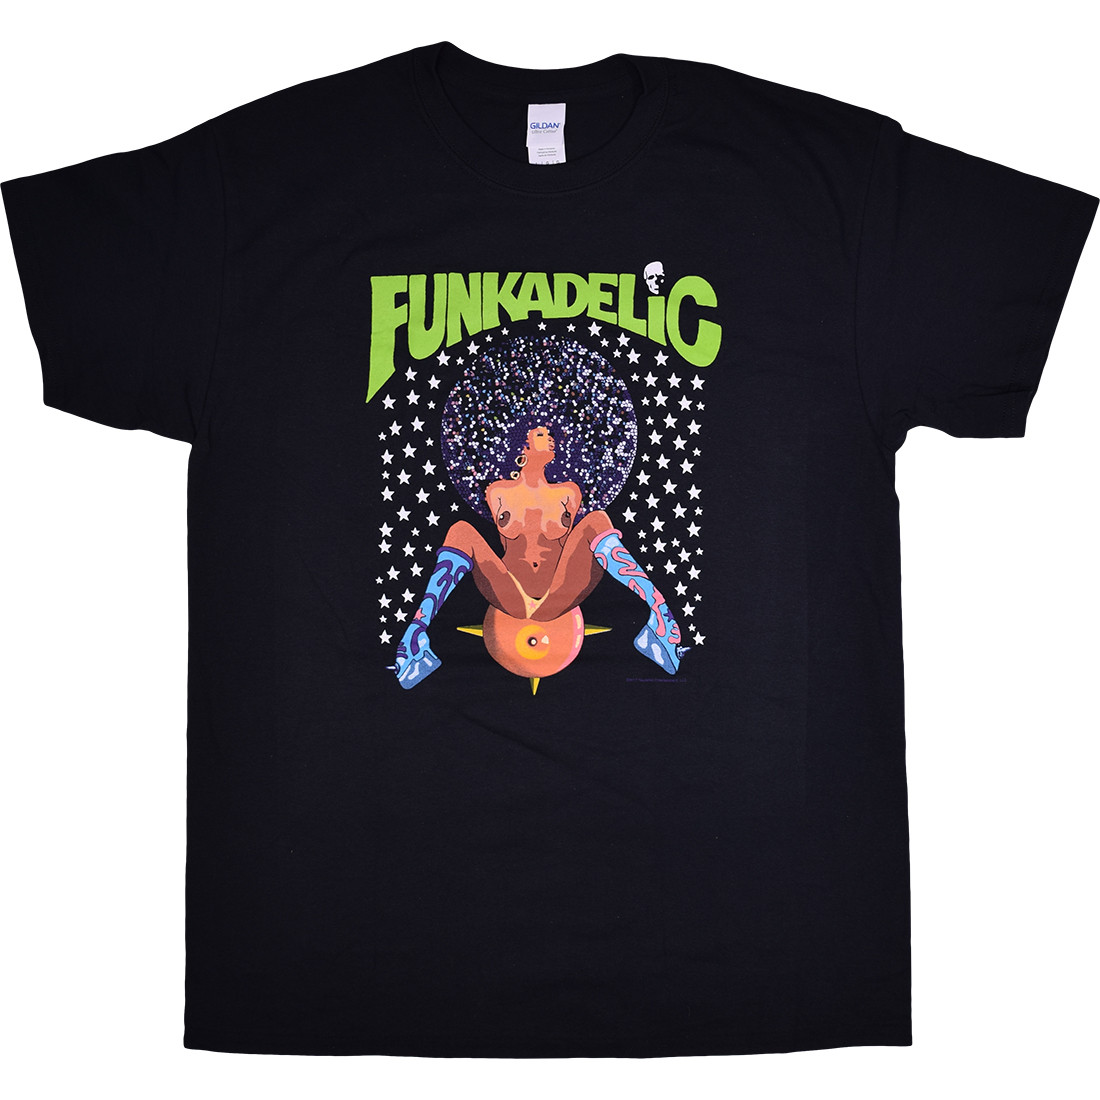 Funkadelic Afro Girl Black T-Shirt